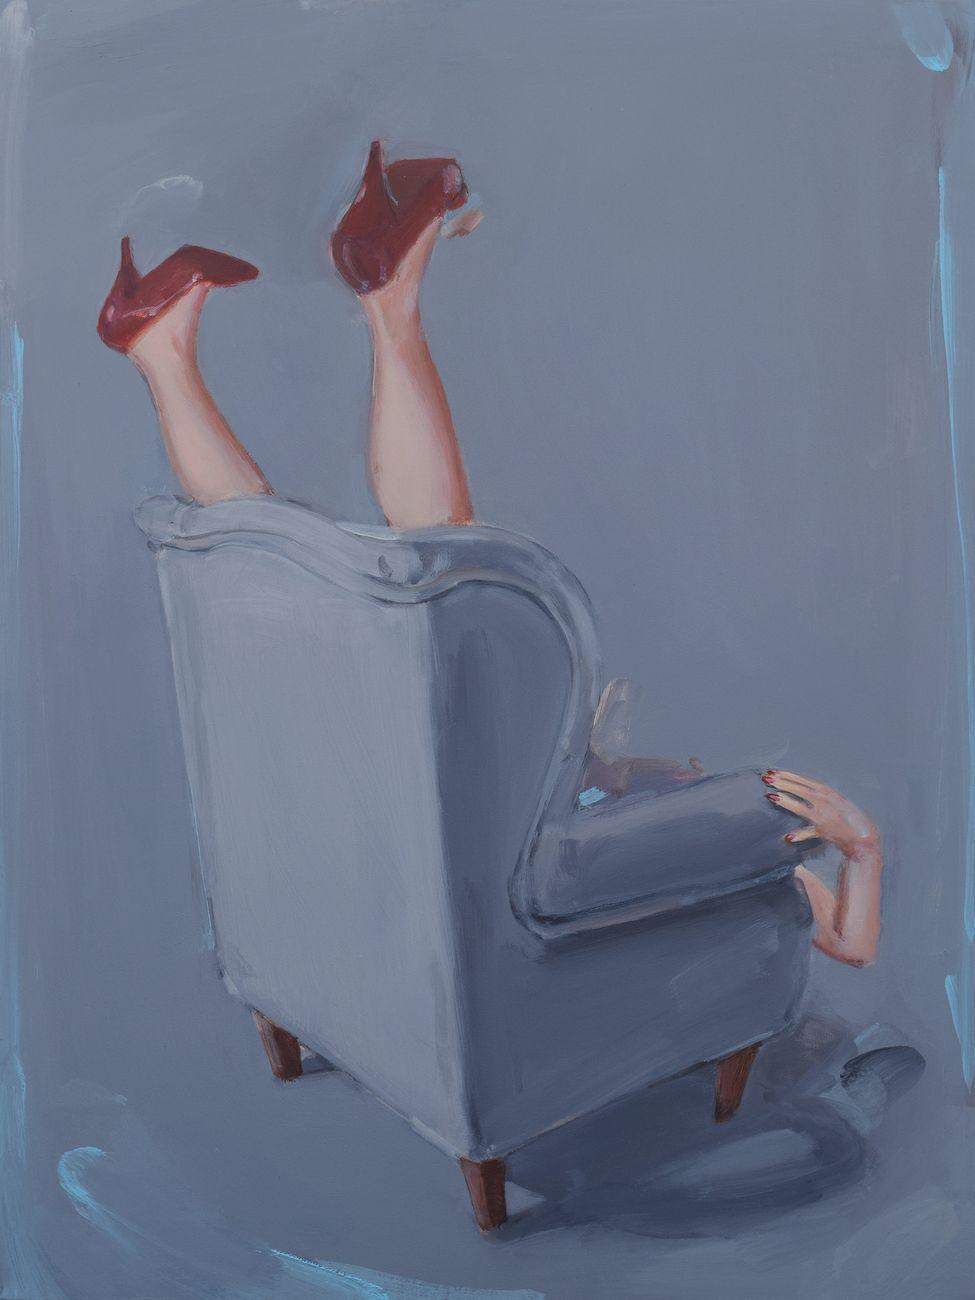 romina-bassu-paintings-everythingwithatwist-06